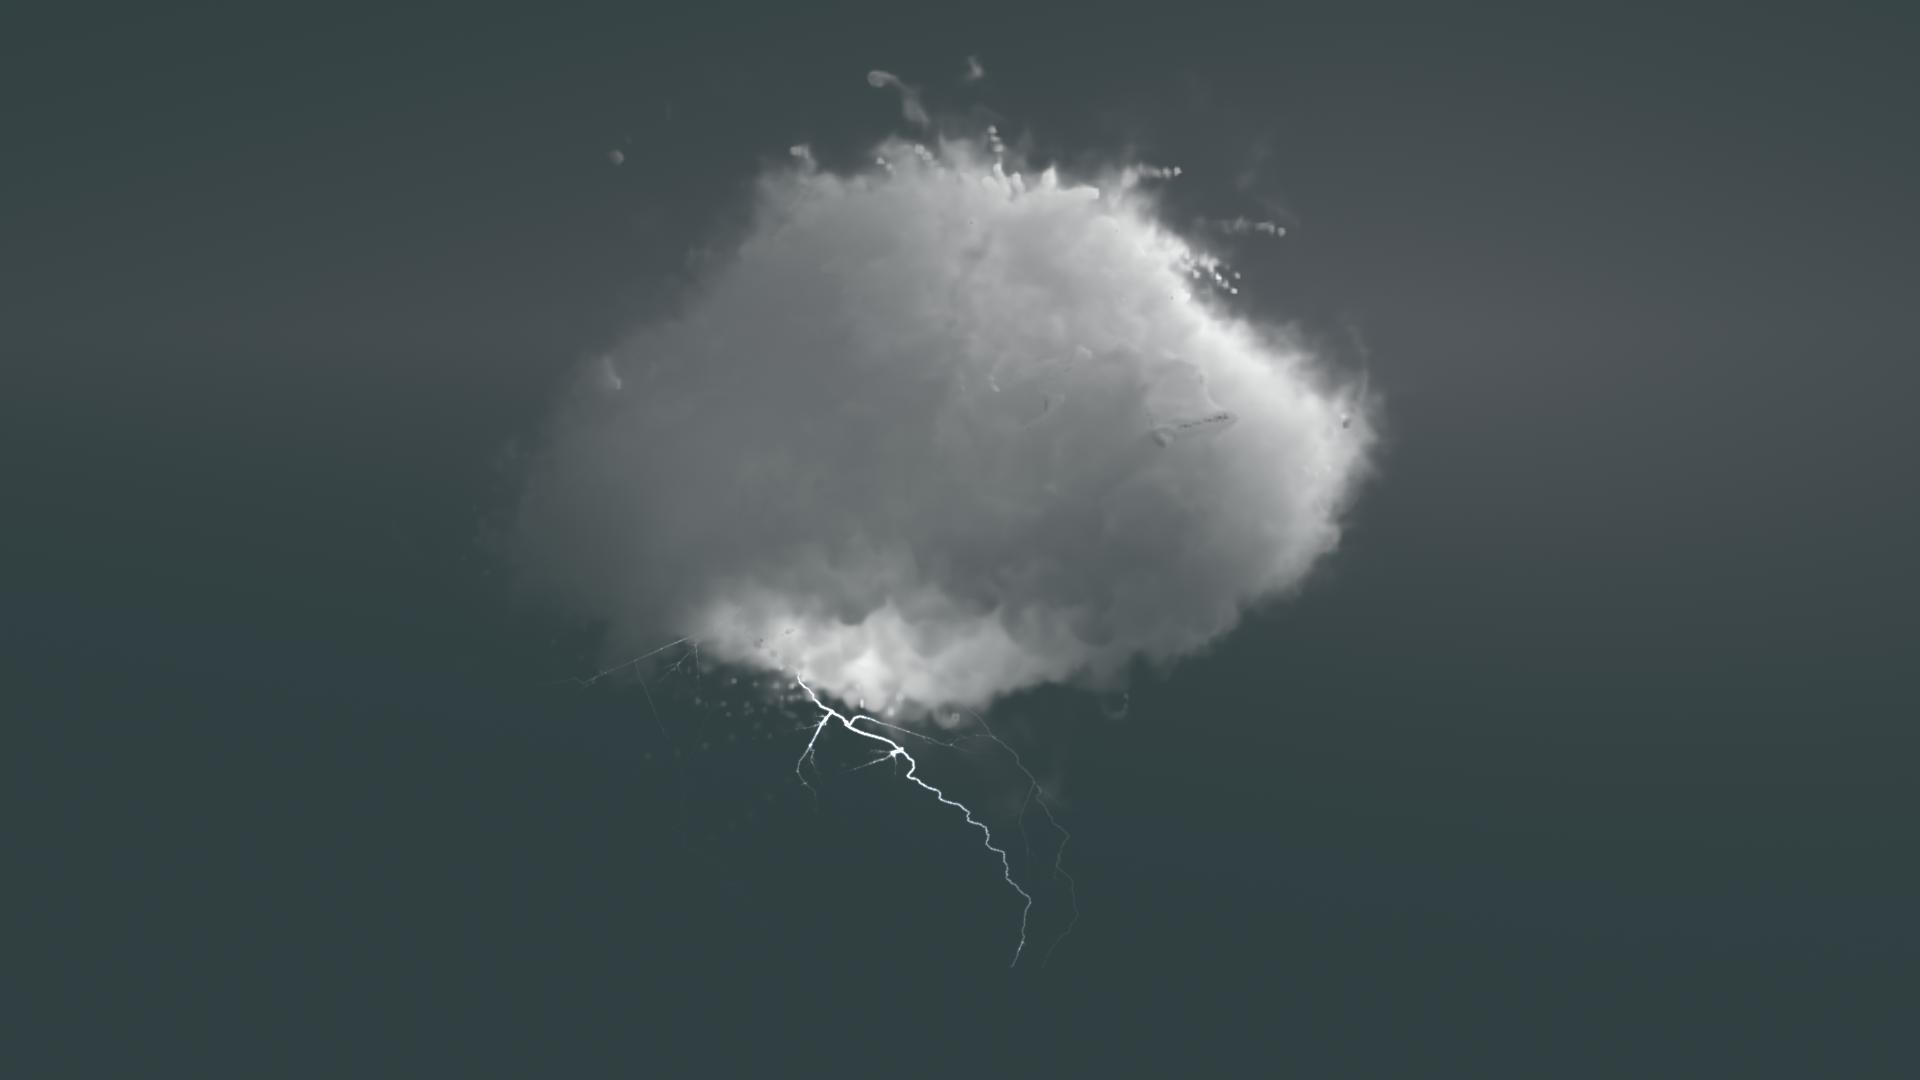 Lil' Stormy Cloud